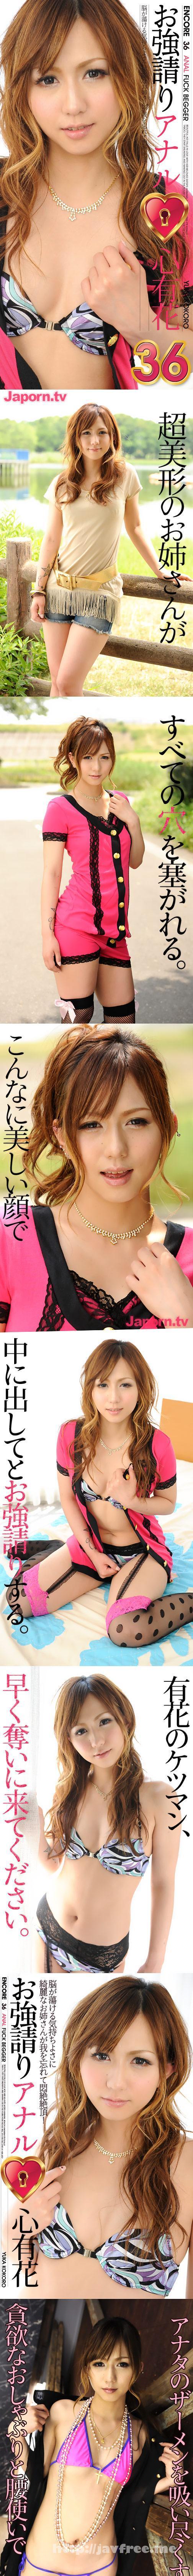 [S2M 036] アンコール Vol.36 お強請りアナル : 心有花 心有花 Yuuka Kokoro S2M